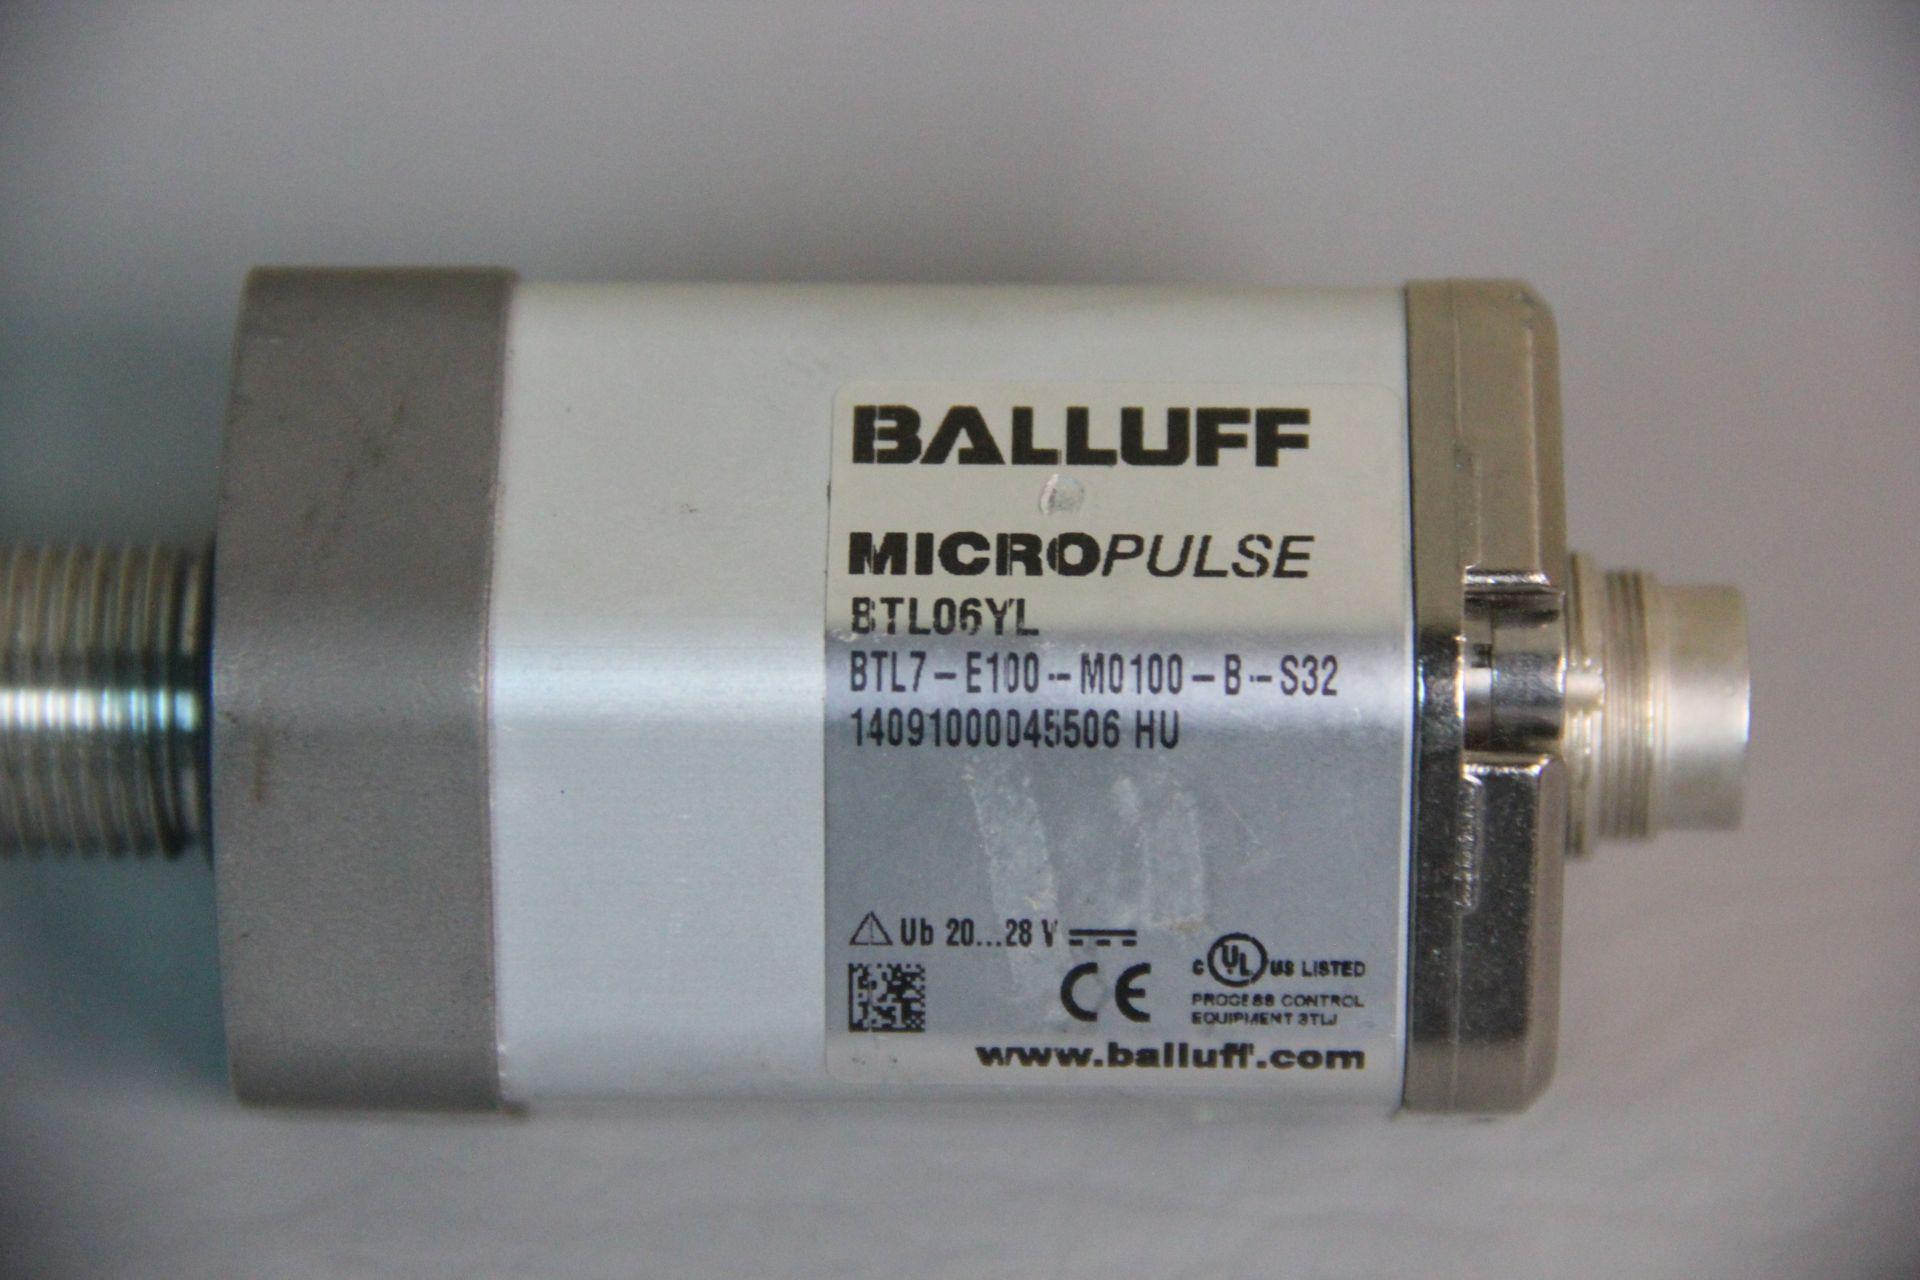 BALLUFF MICROPULSE MAGNETOSTRICTIVE LINEAR POSITION SENSOR - Image 2 of 4